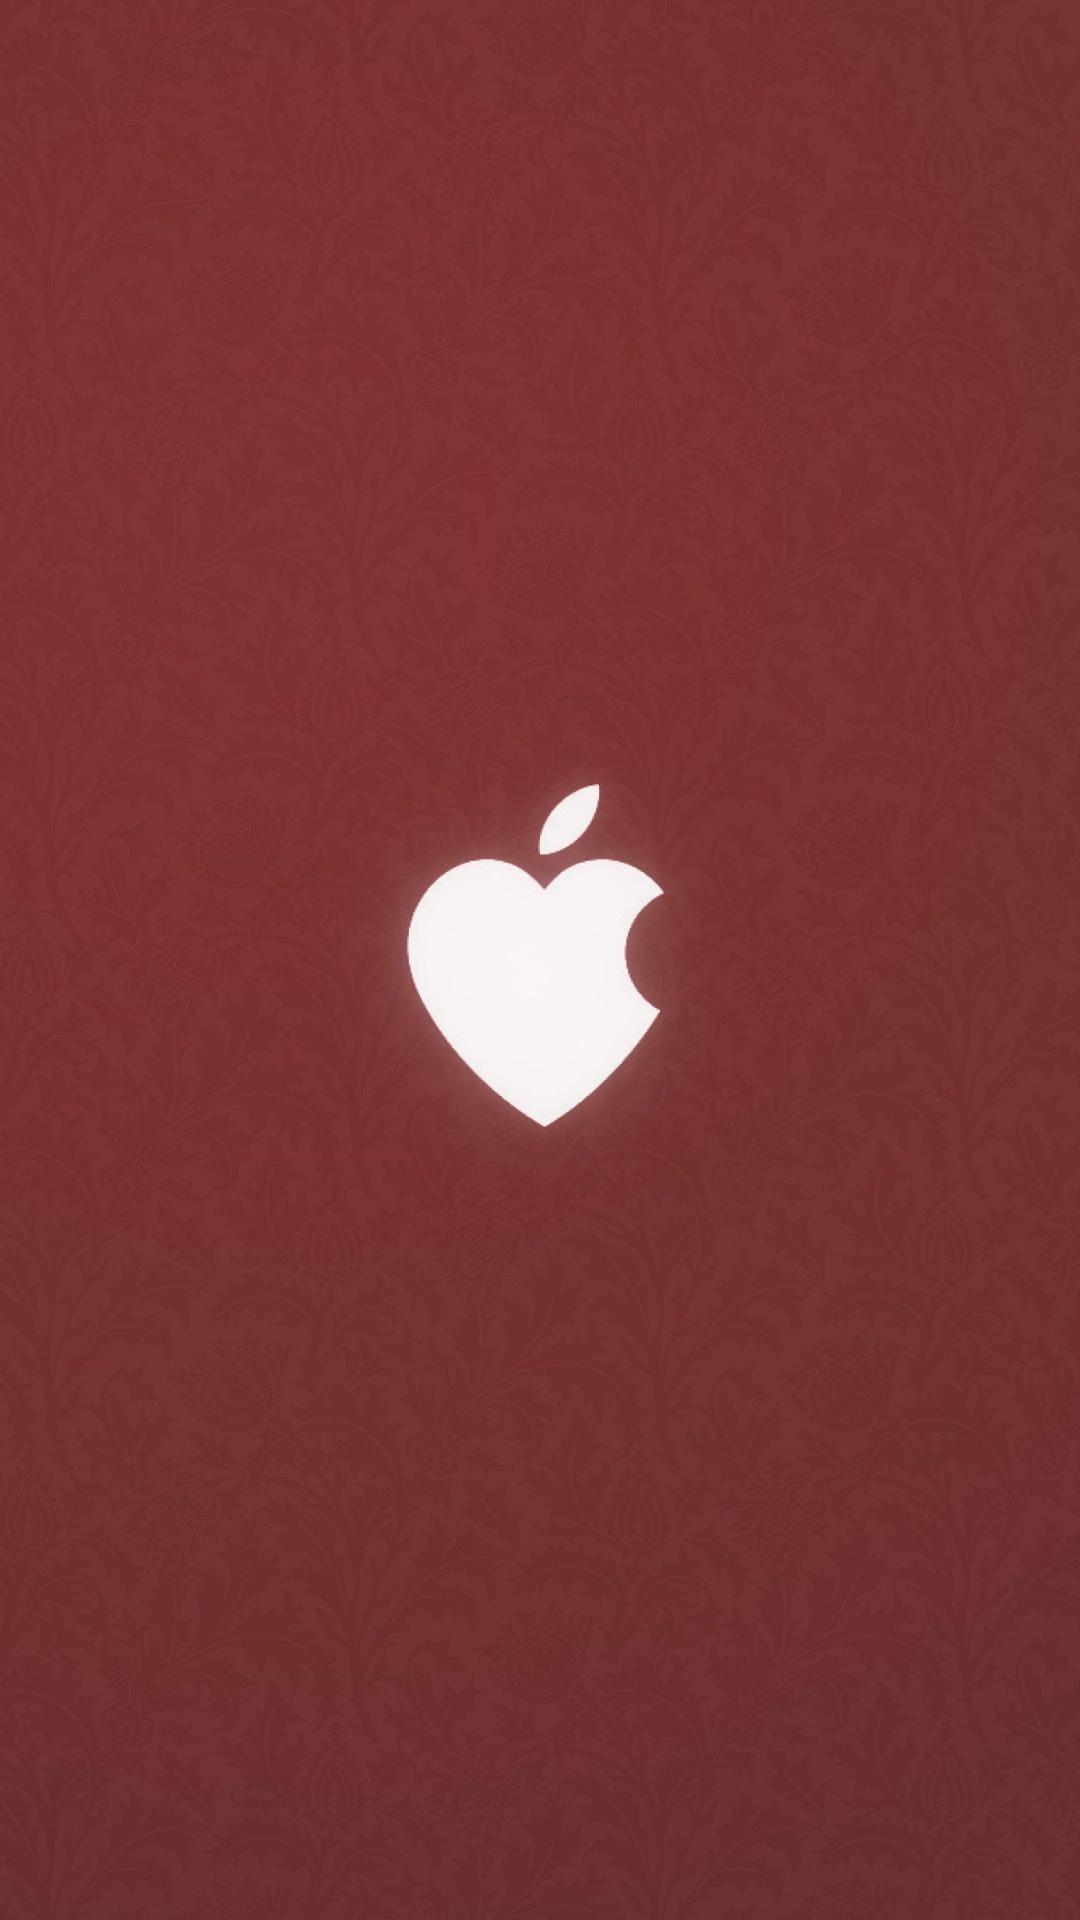 Appleハート Wallpaper Sc スマホ壁紙